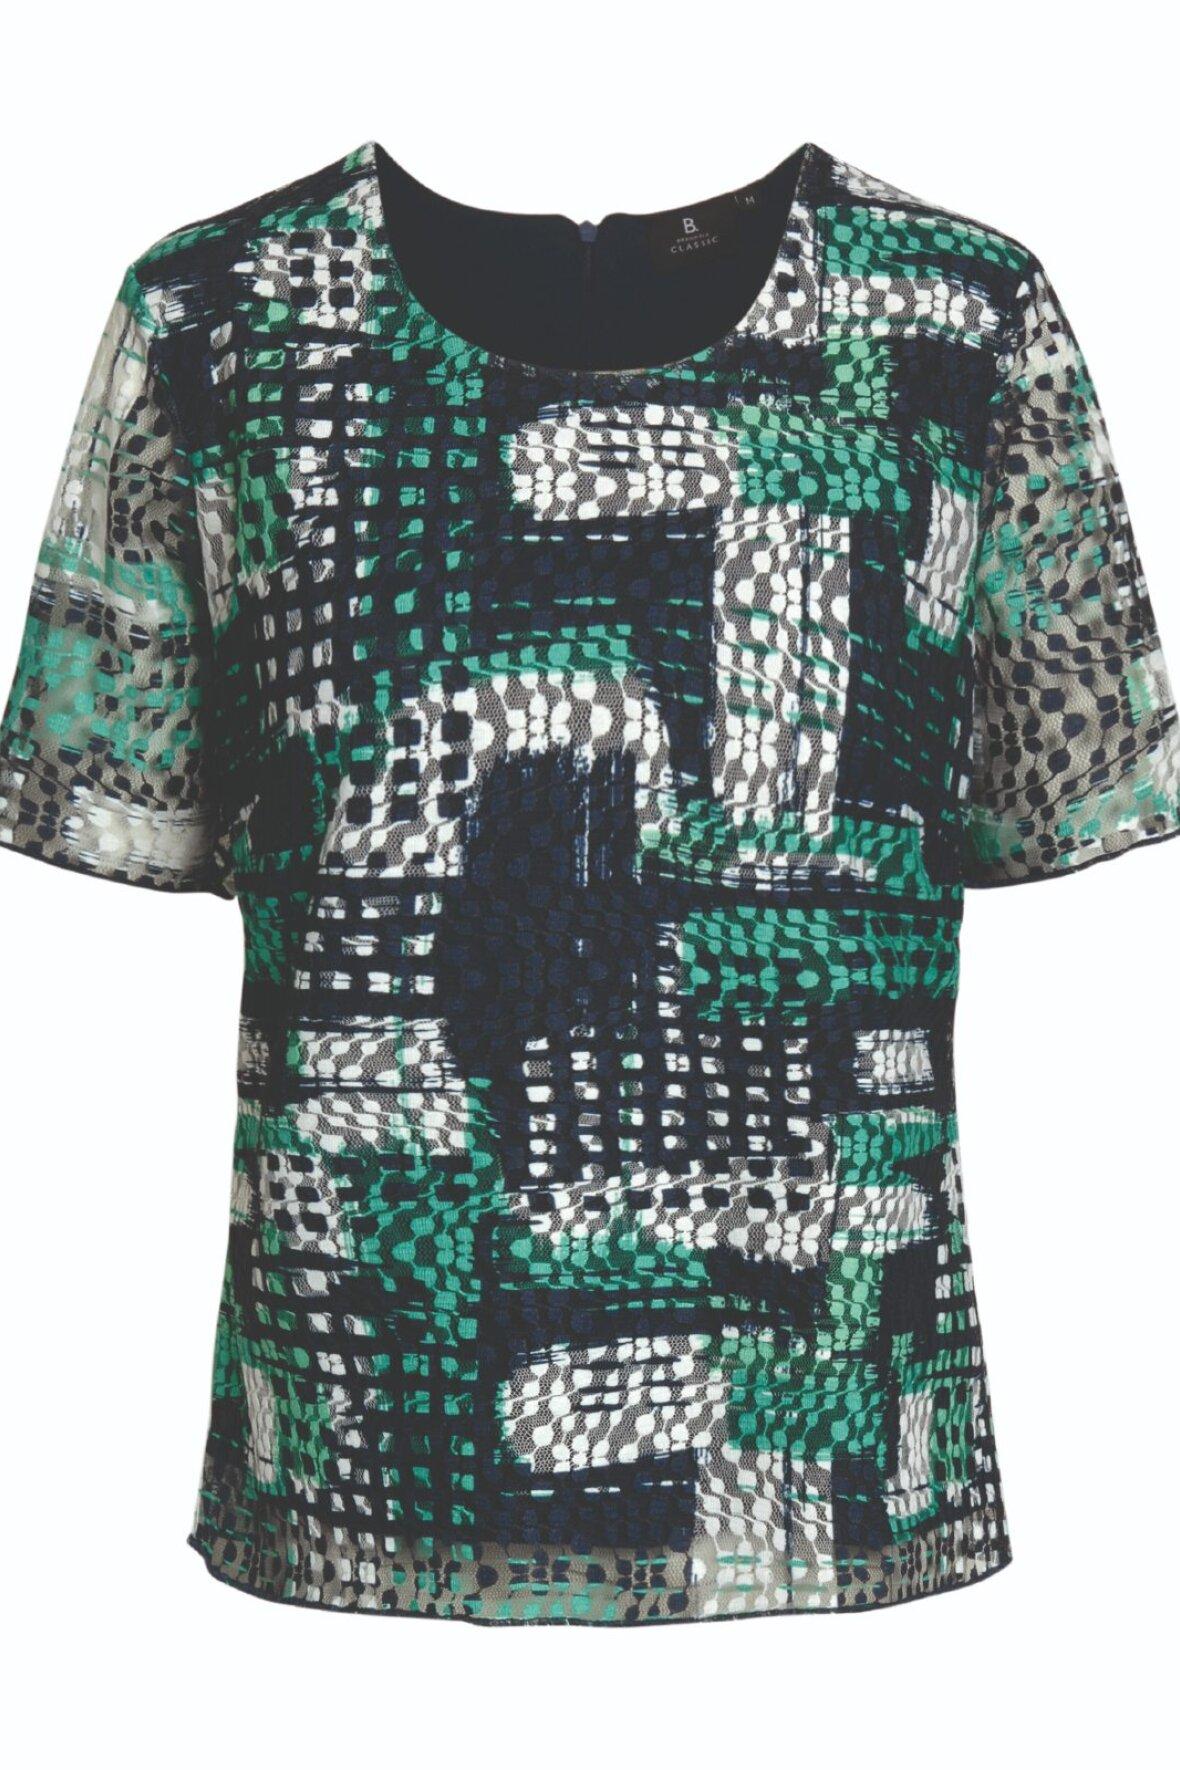 3716a3b5a Brandtex Classic festlig bluse flerfarvet til damer - Hos Lohse